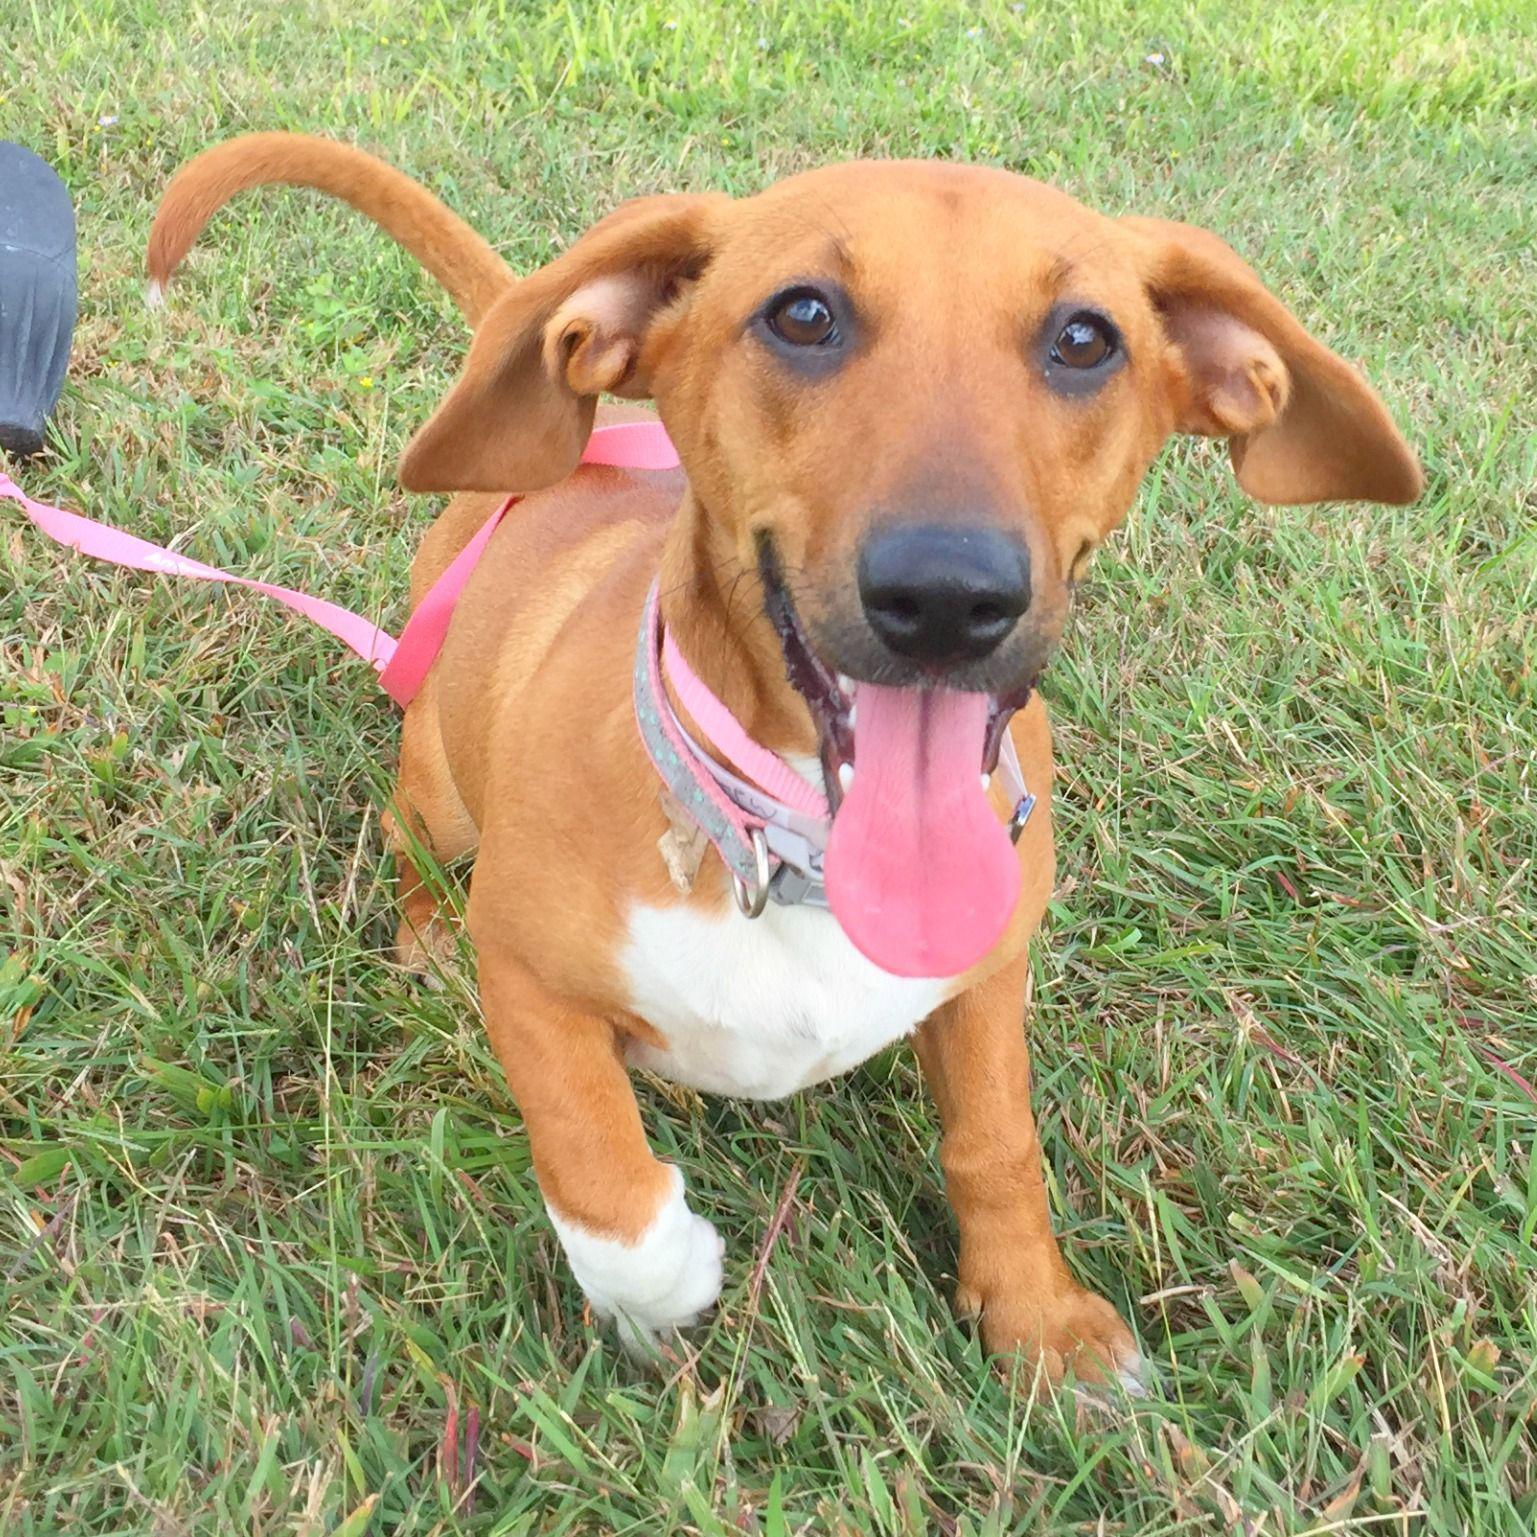 Miniature Dachshund Puppies For Adoption In Texas 2021